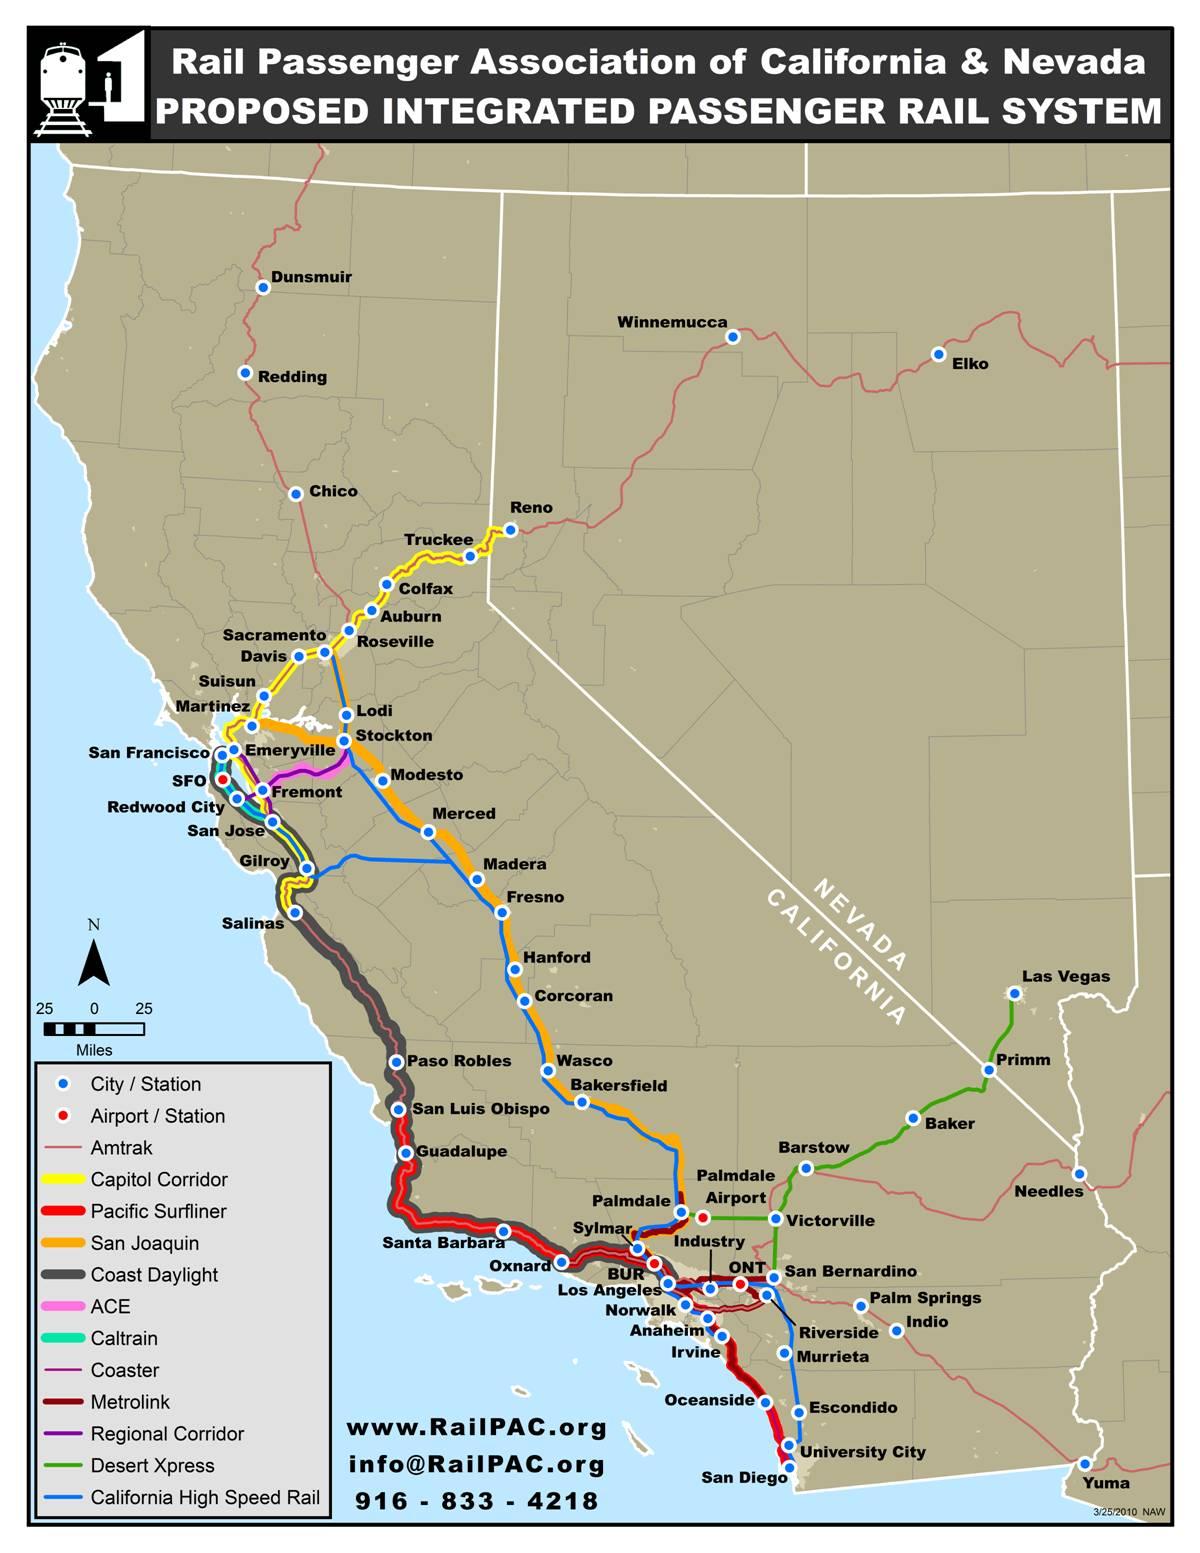 Proposed Passenger Rail System